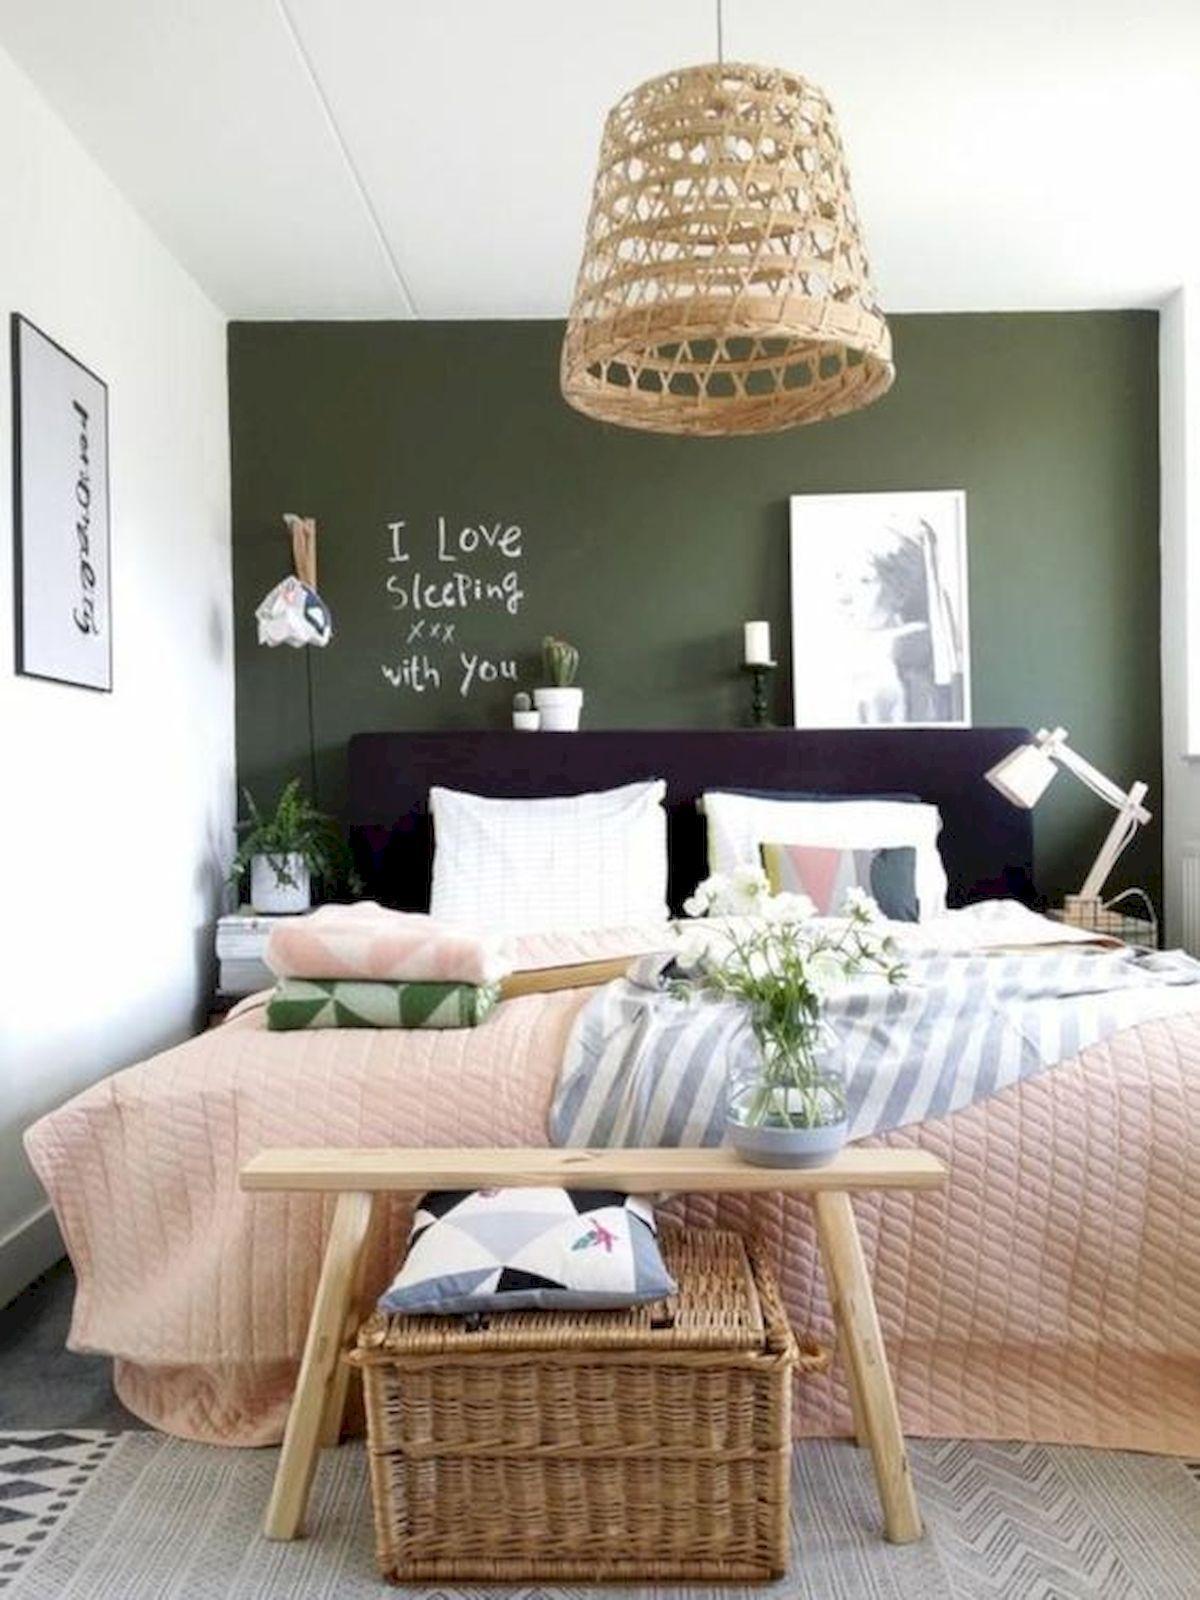 cum alegi mobila penru un dormitor mic perete